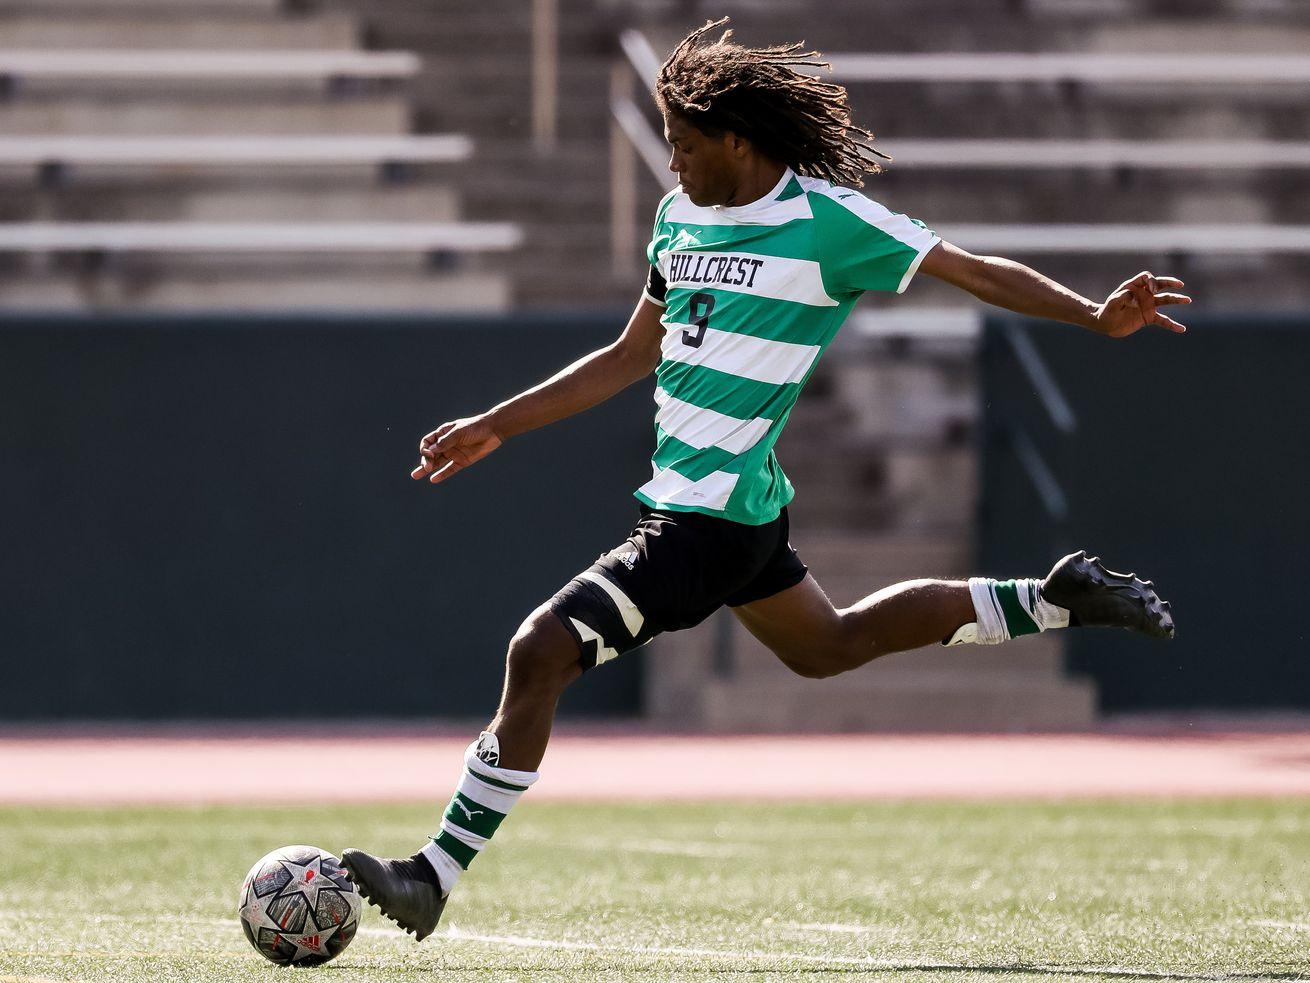 High school boys soccer: Hilario Cruz hat trick leads Hillcrest past Highland in first round of 5A playoffs